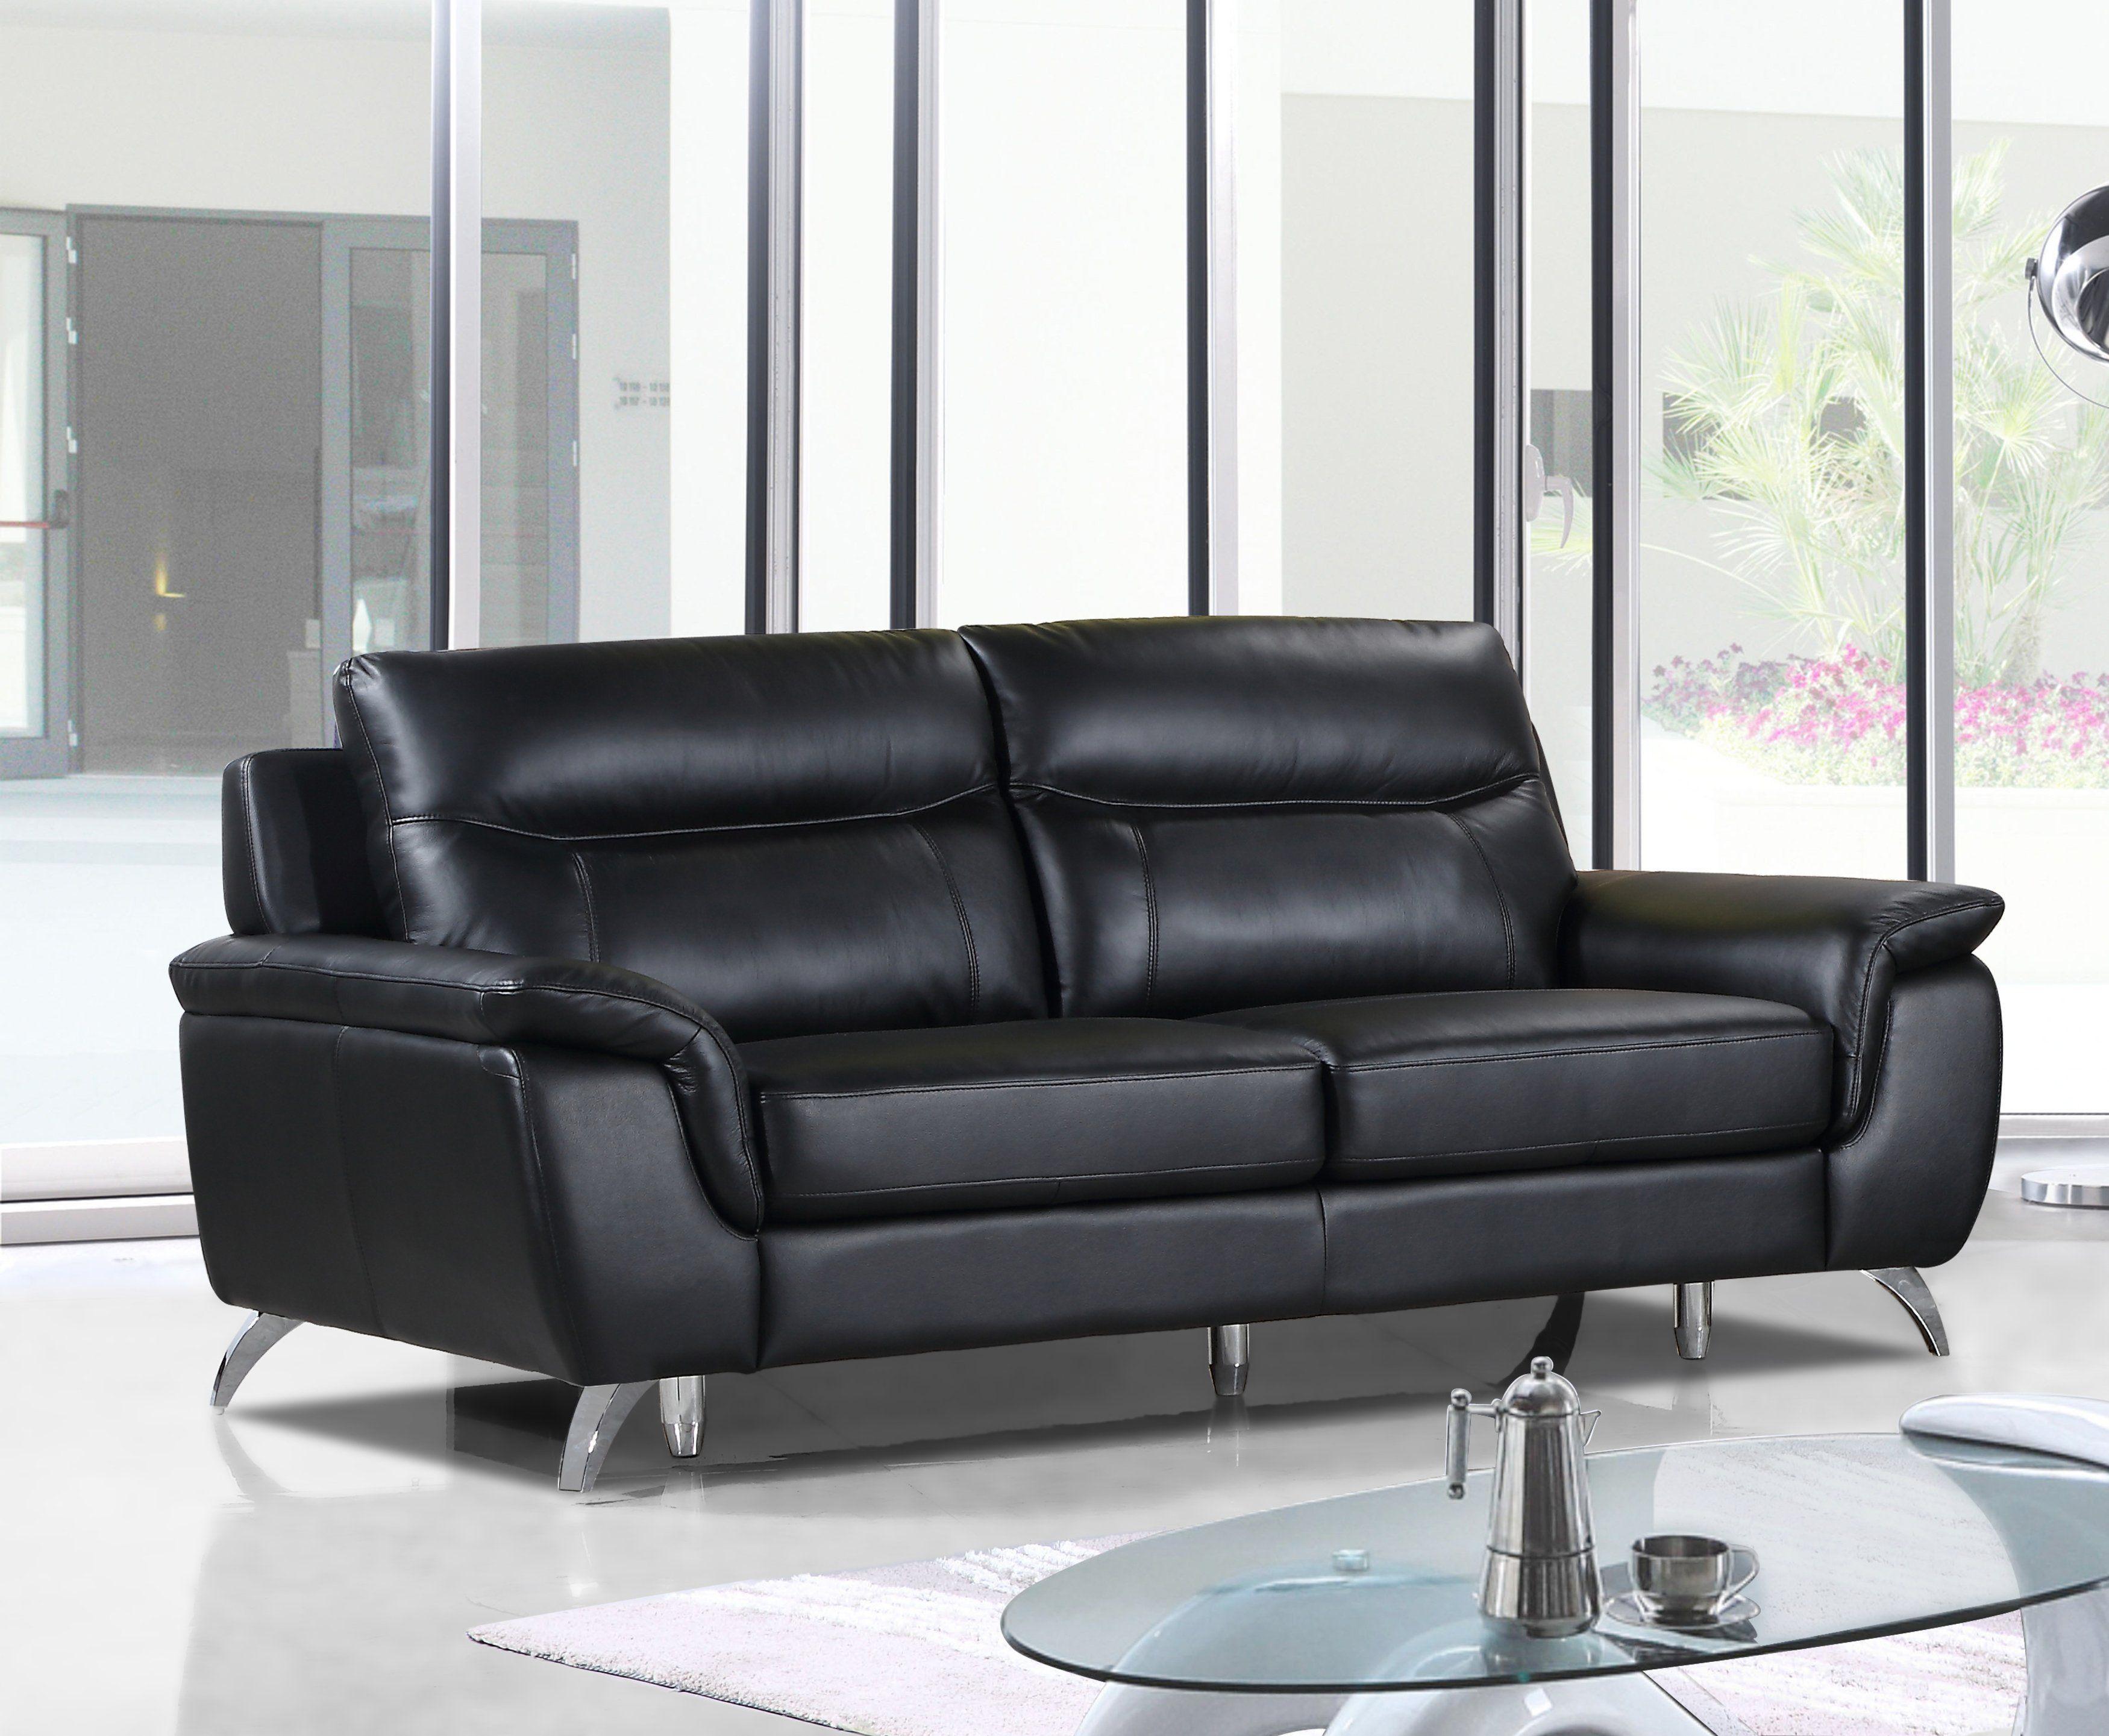 Cortesi Home Chicago Genuine Leather Sofa, Black 79 ...